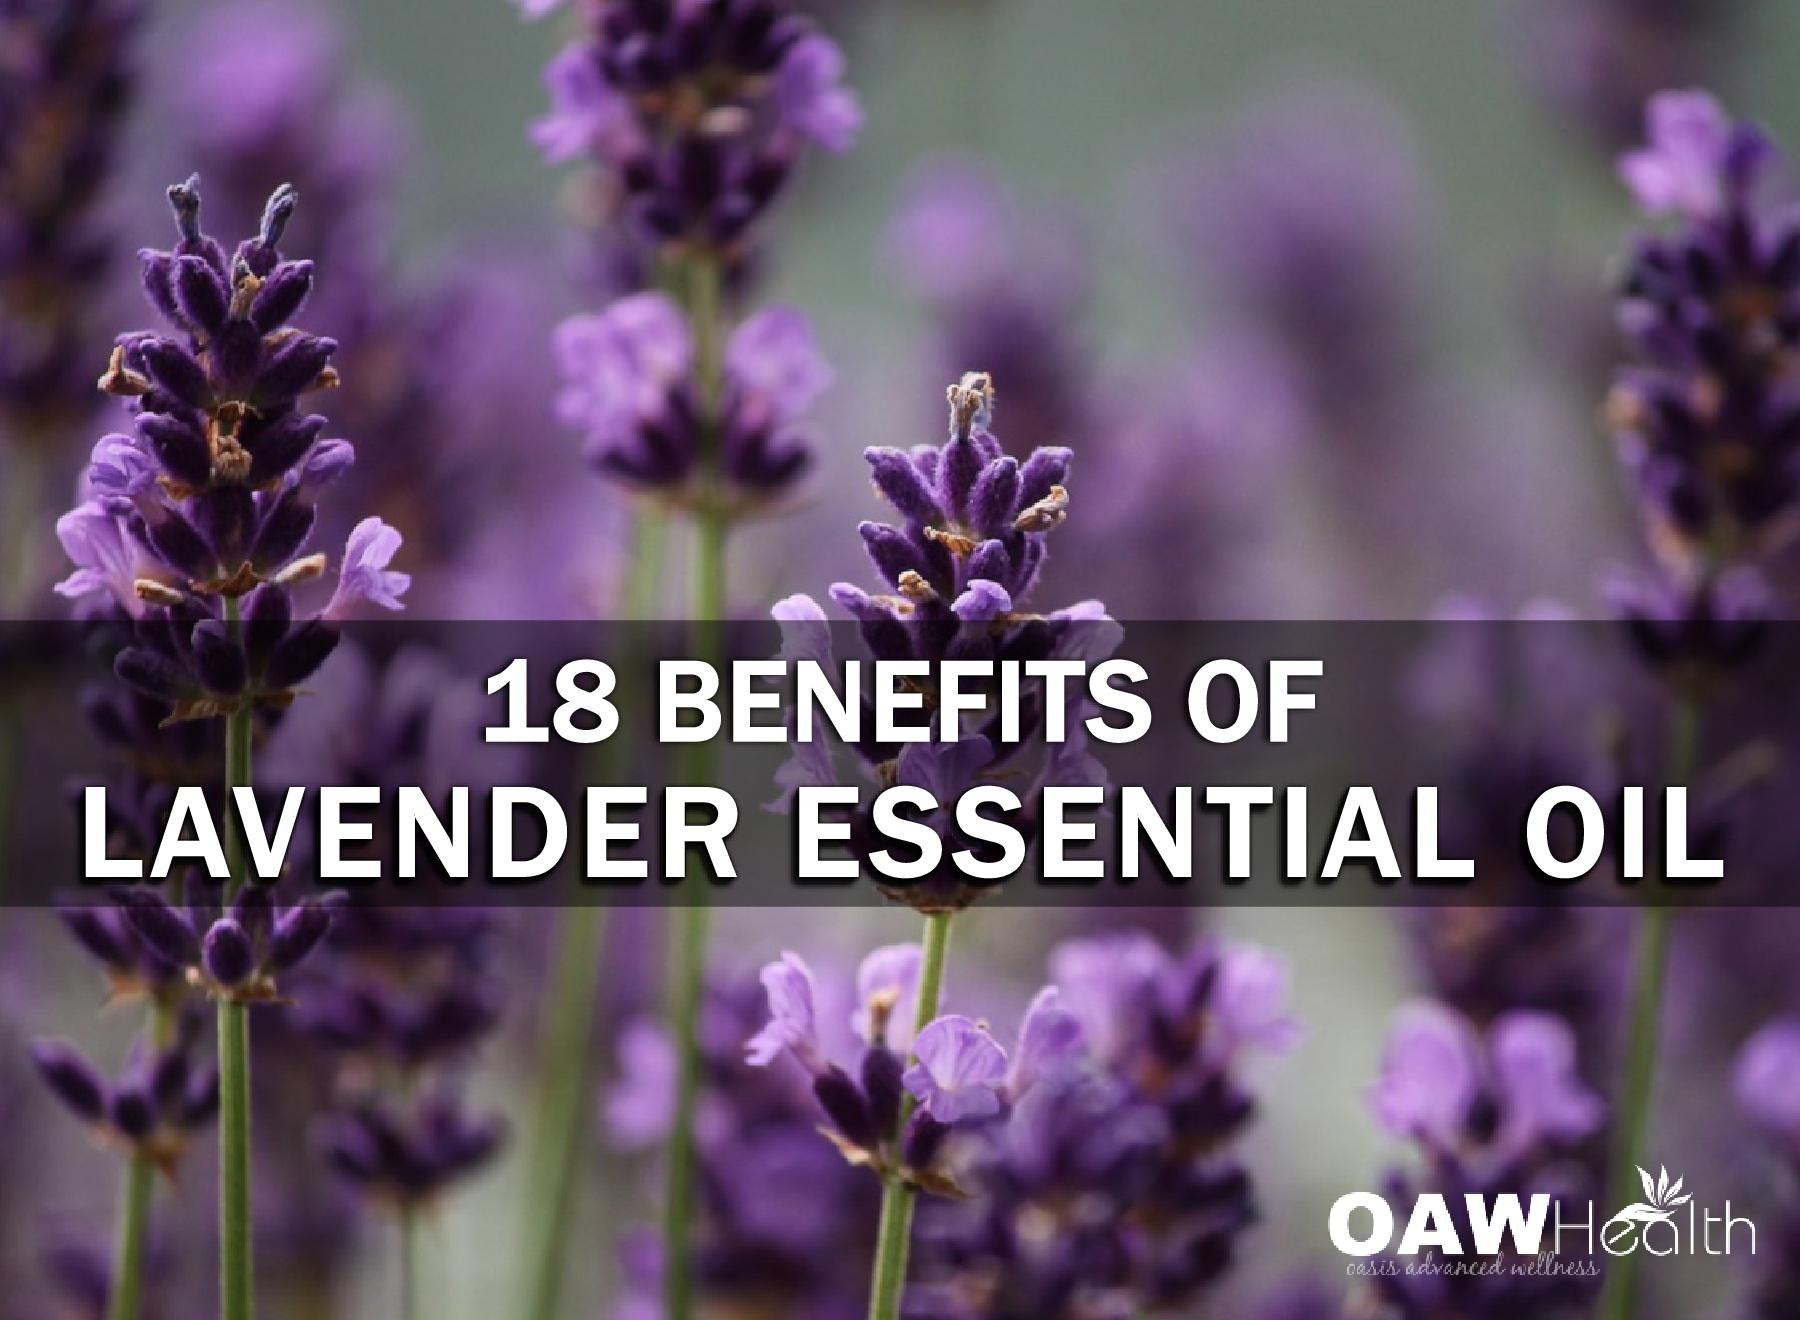 18 Benefits of Lavender Essential Oil